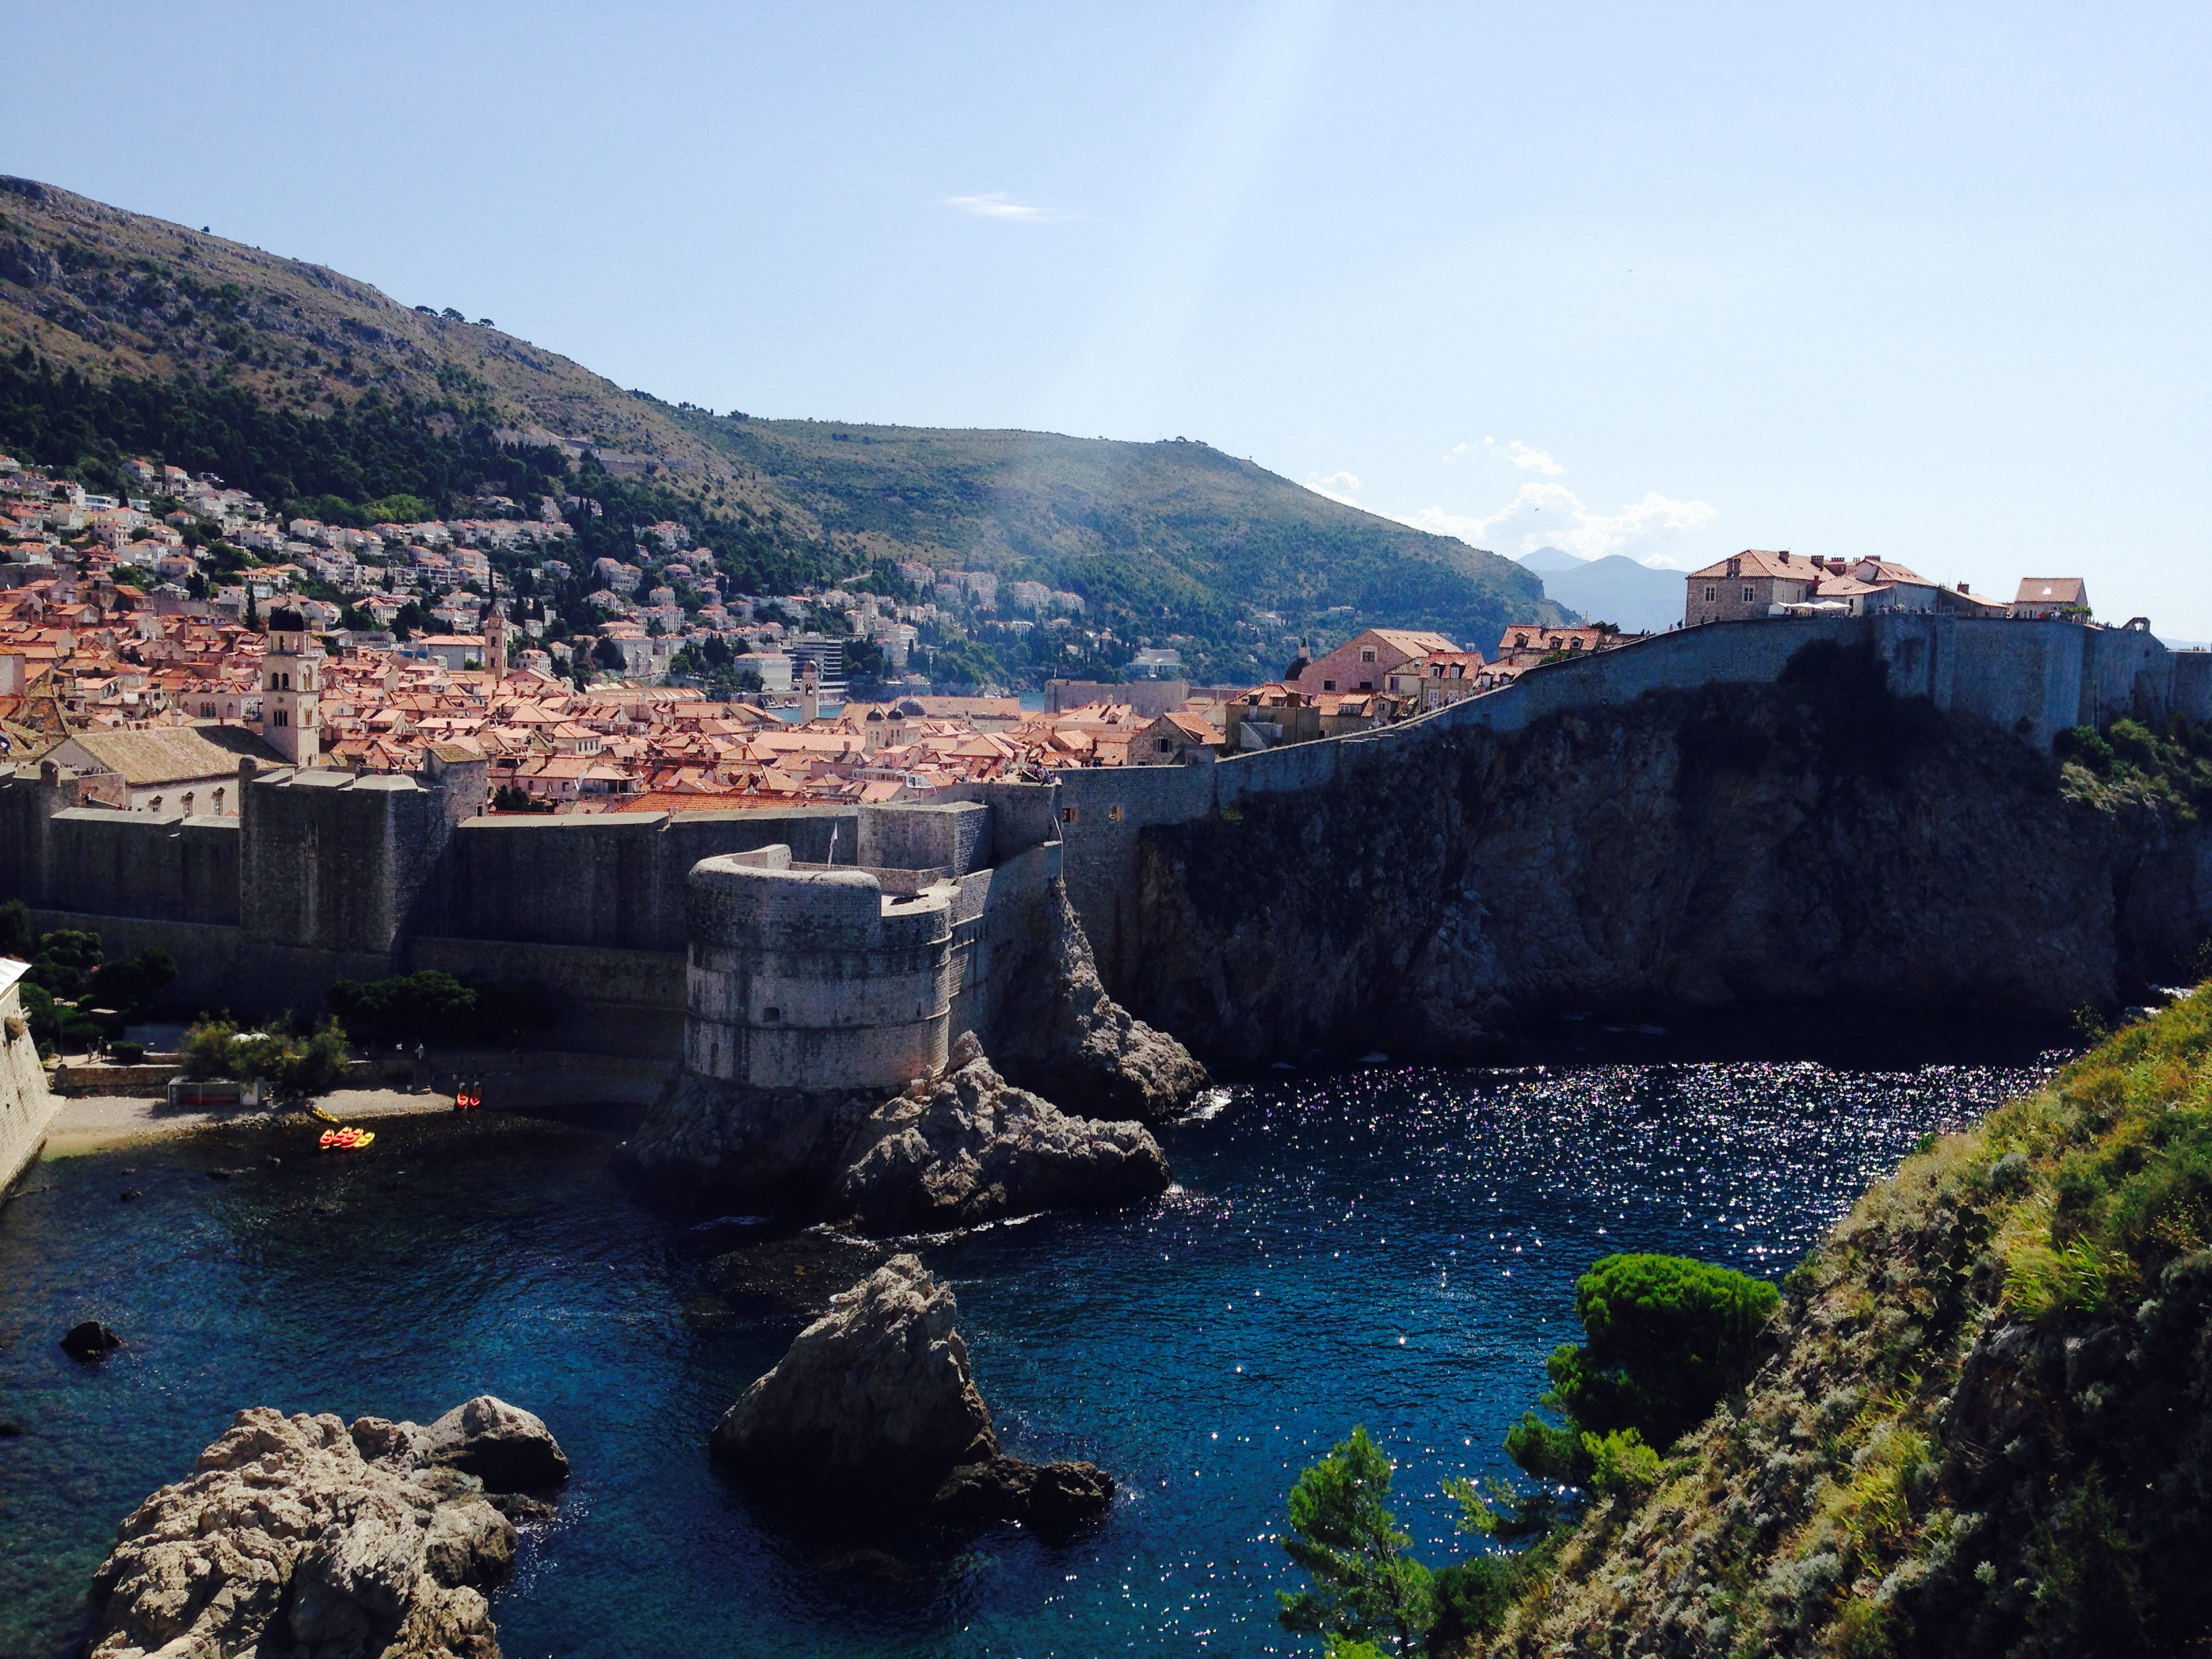 Dubrovnik View from Exterior, Croatia 2014